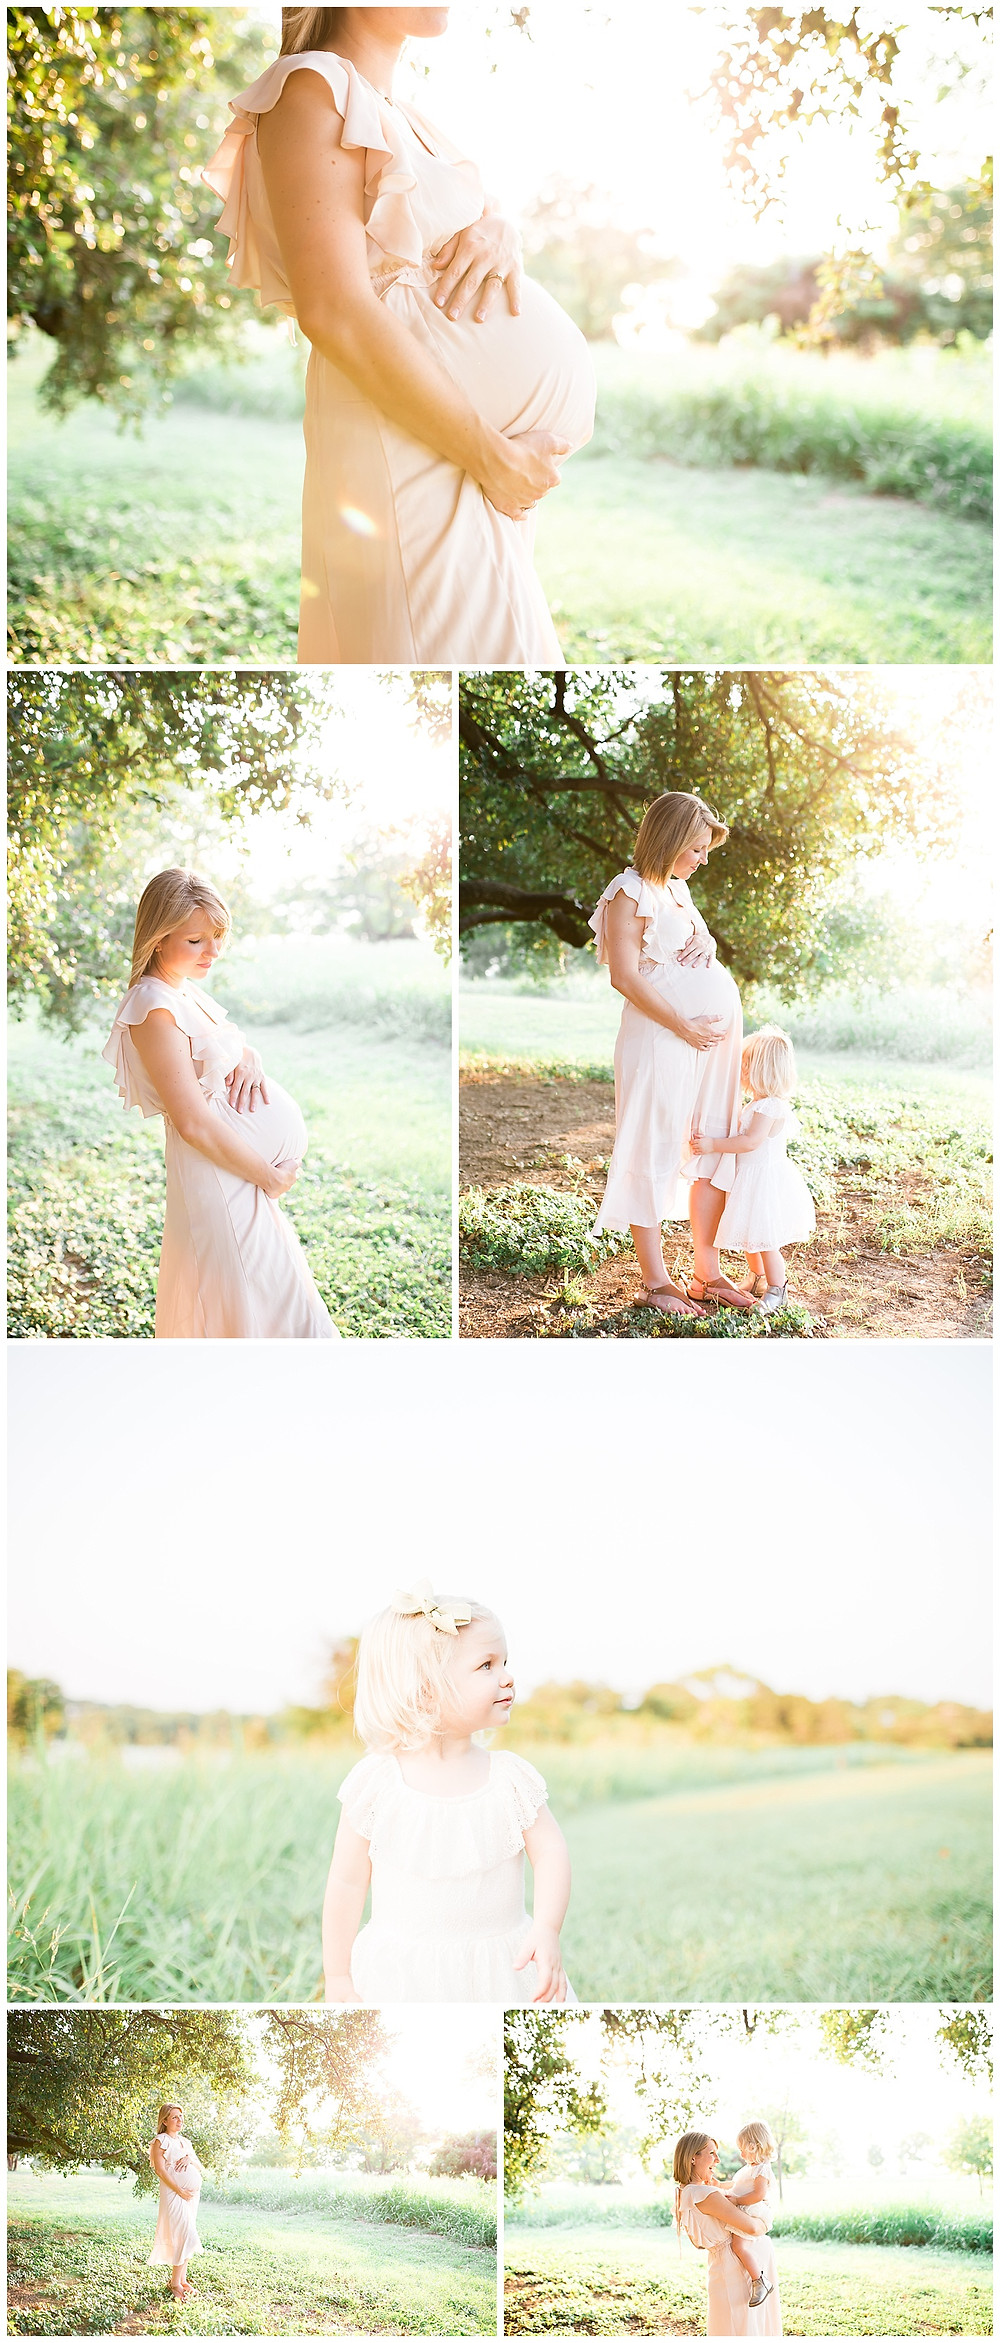 maternity photographer in Dallas, Lexi Meadows Photography